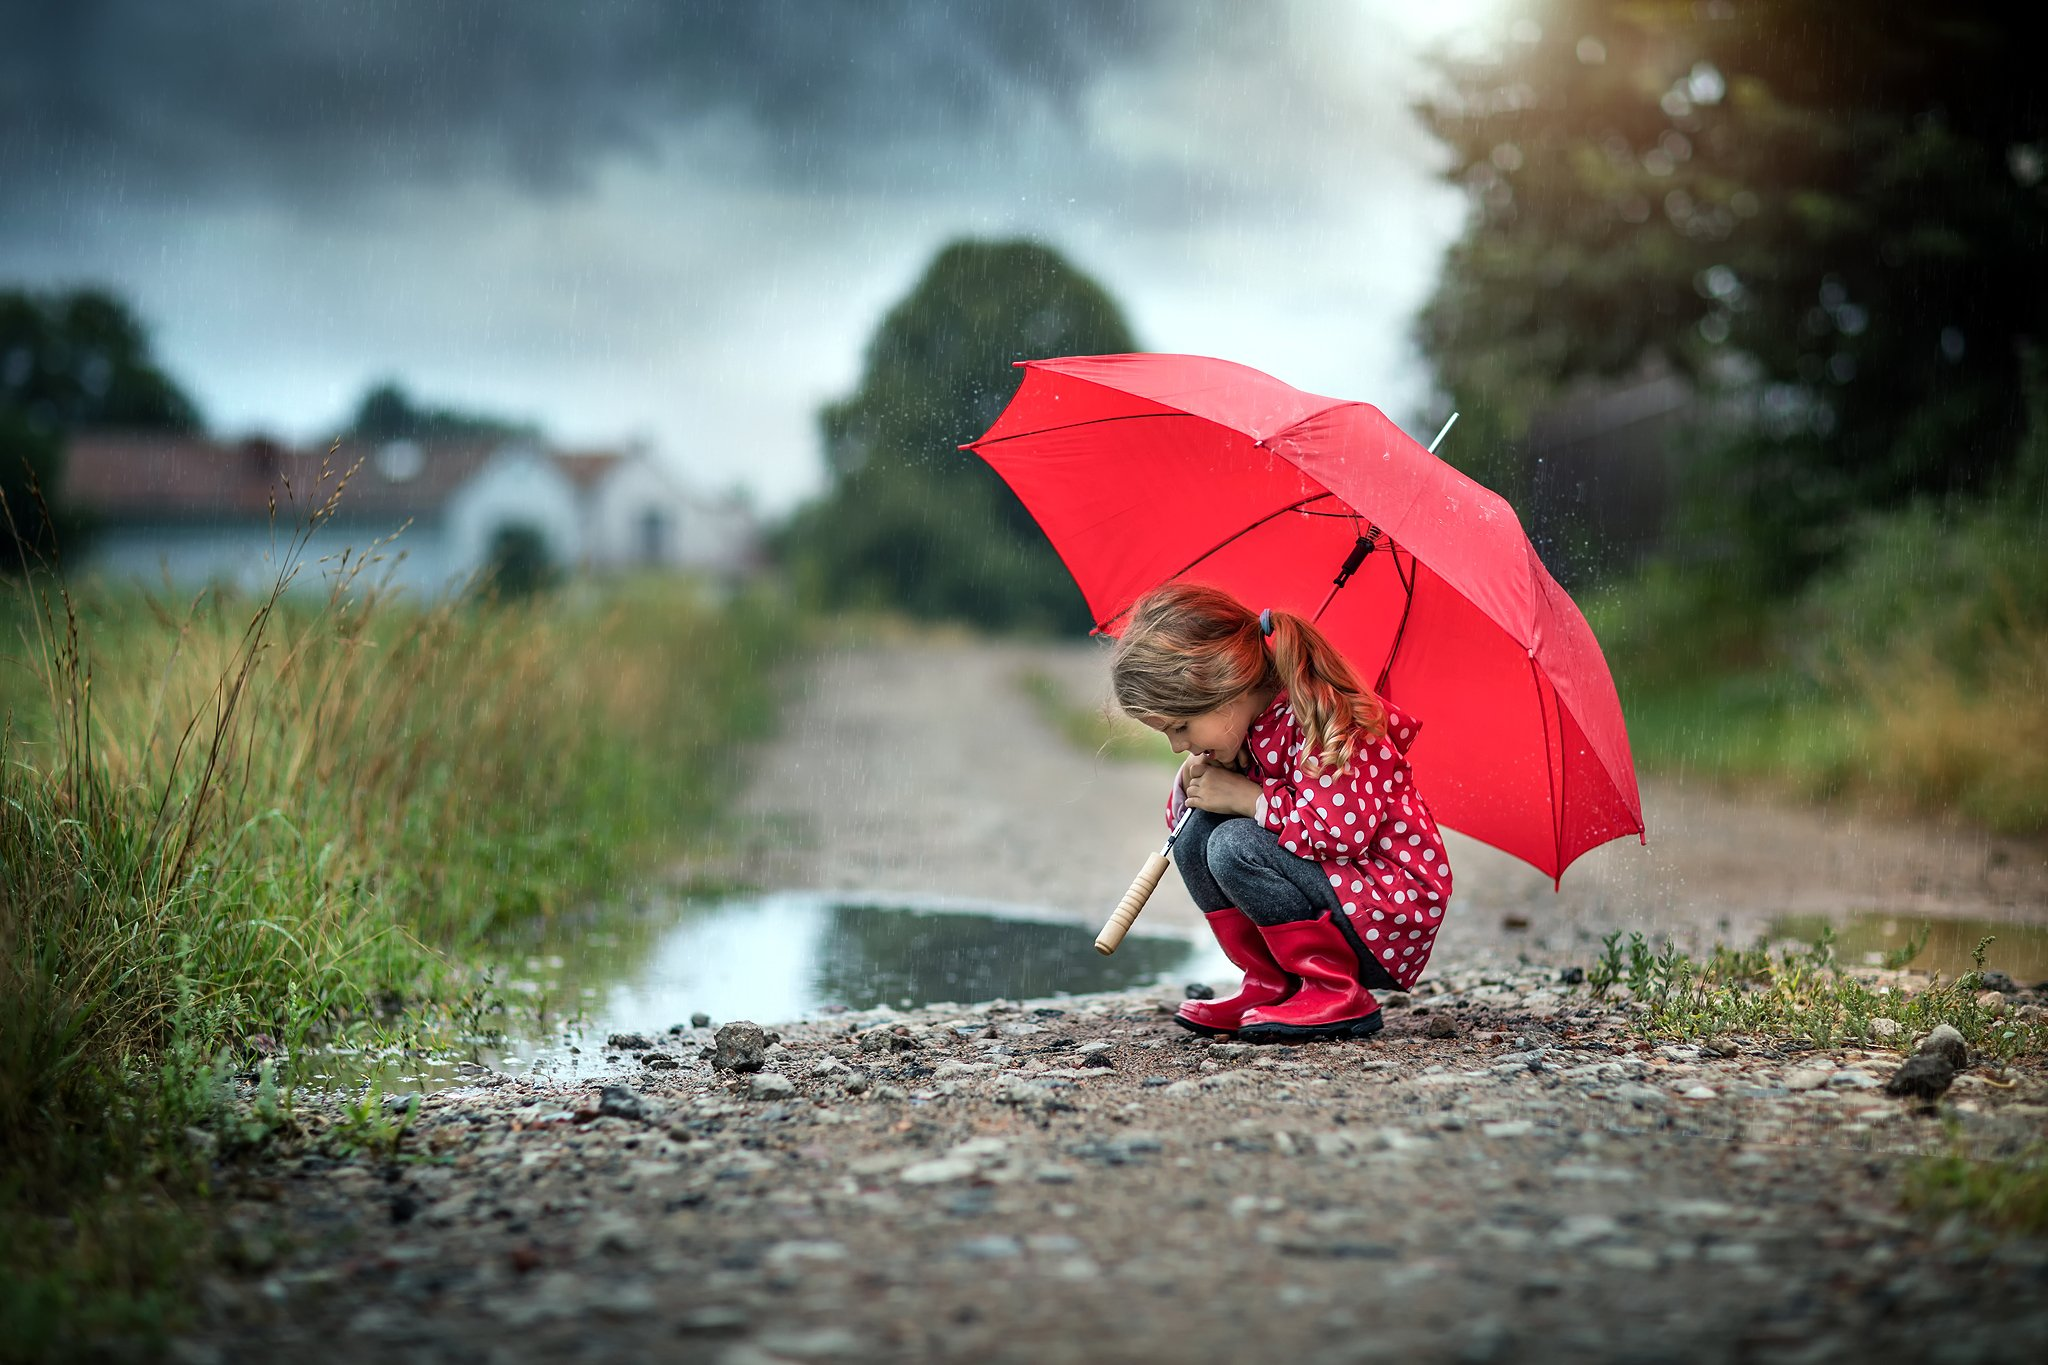 в дождливый день rainy day little girl cute umbrella red road path water, Radoslaw Dranikowski